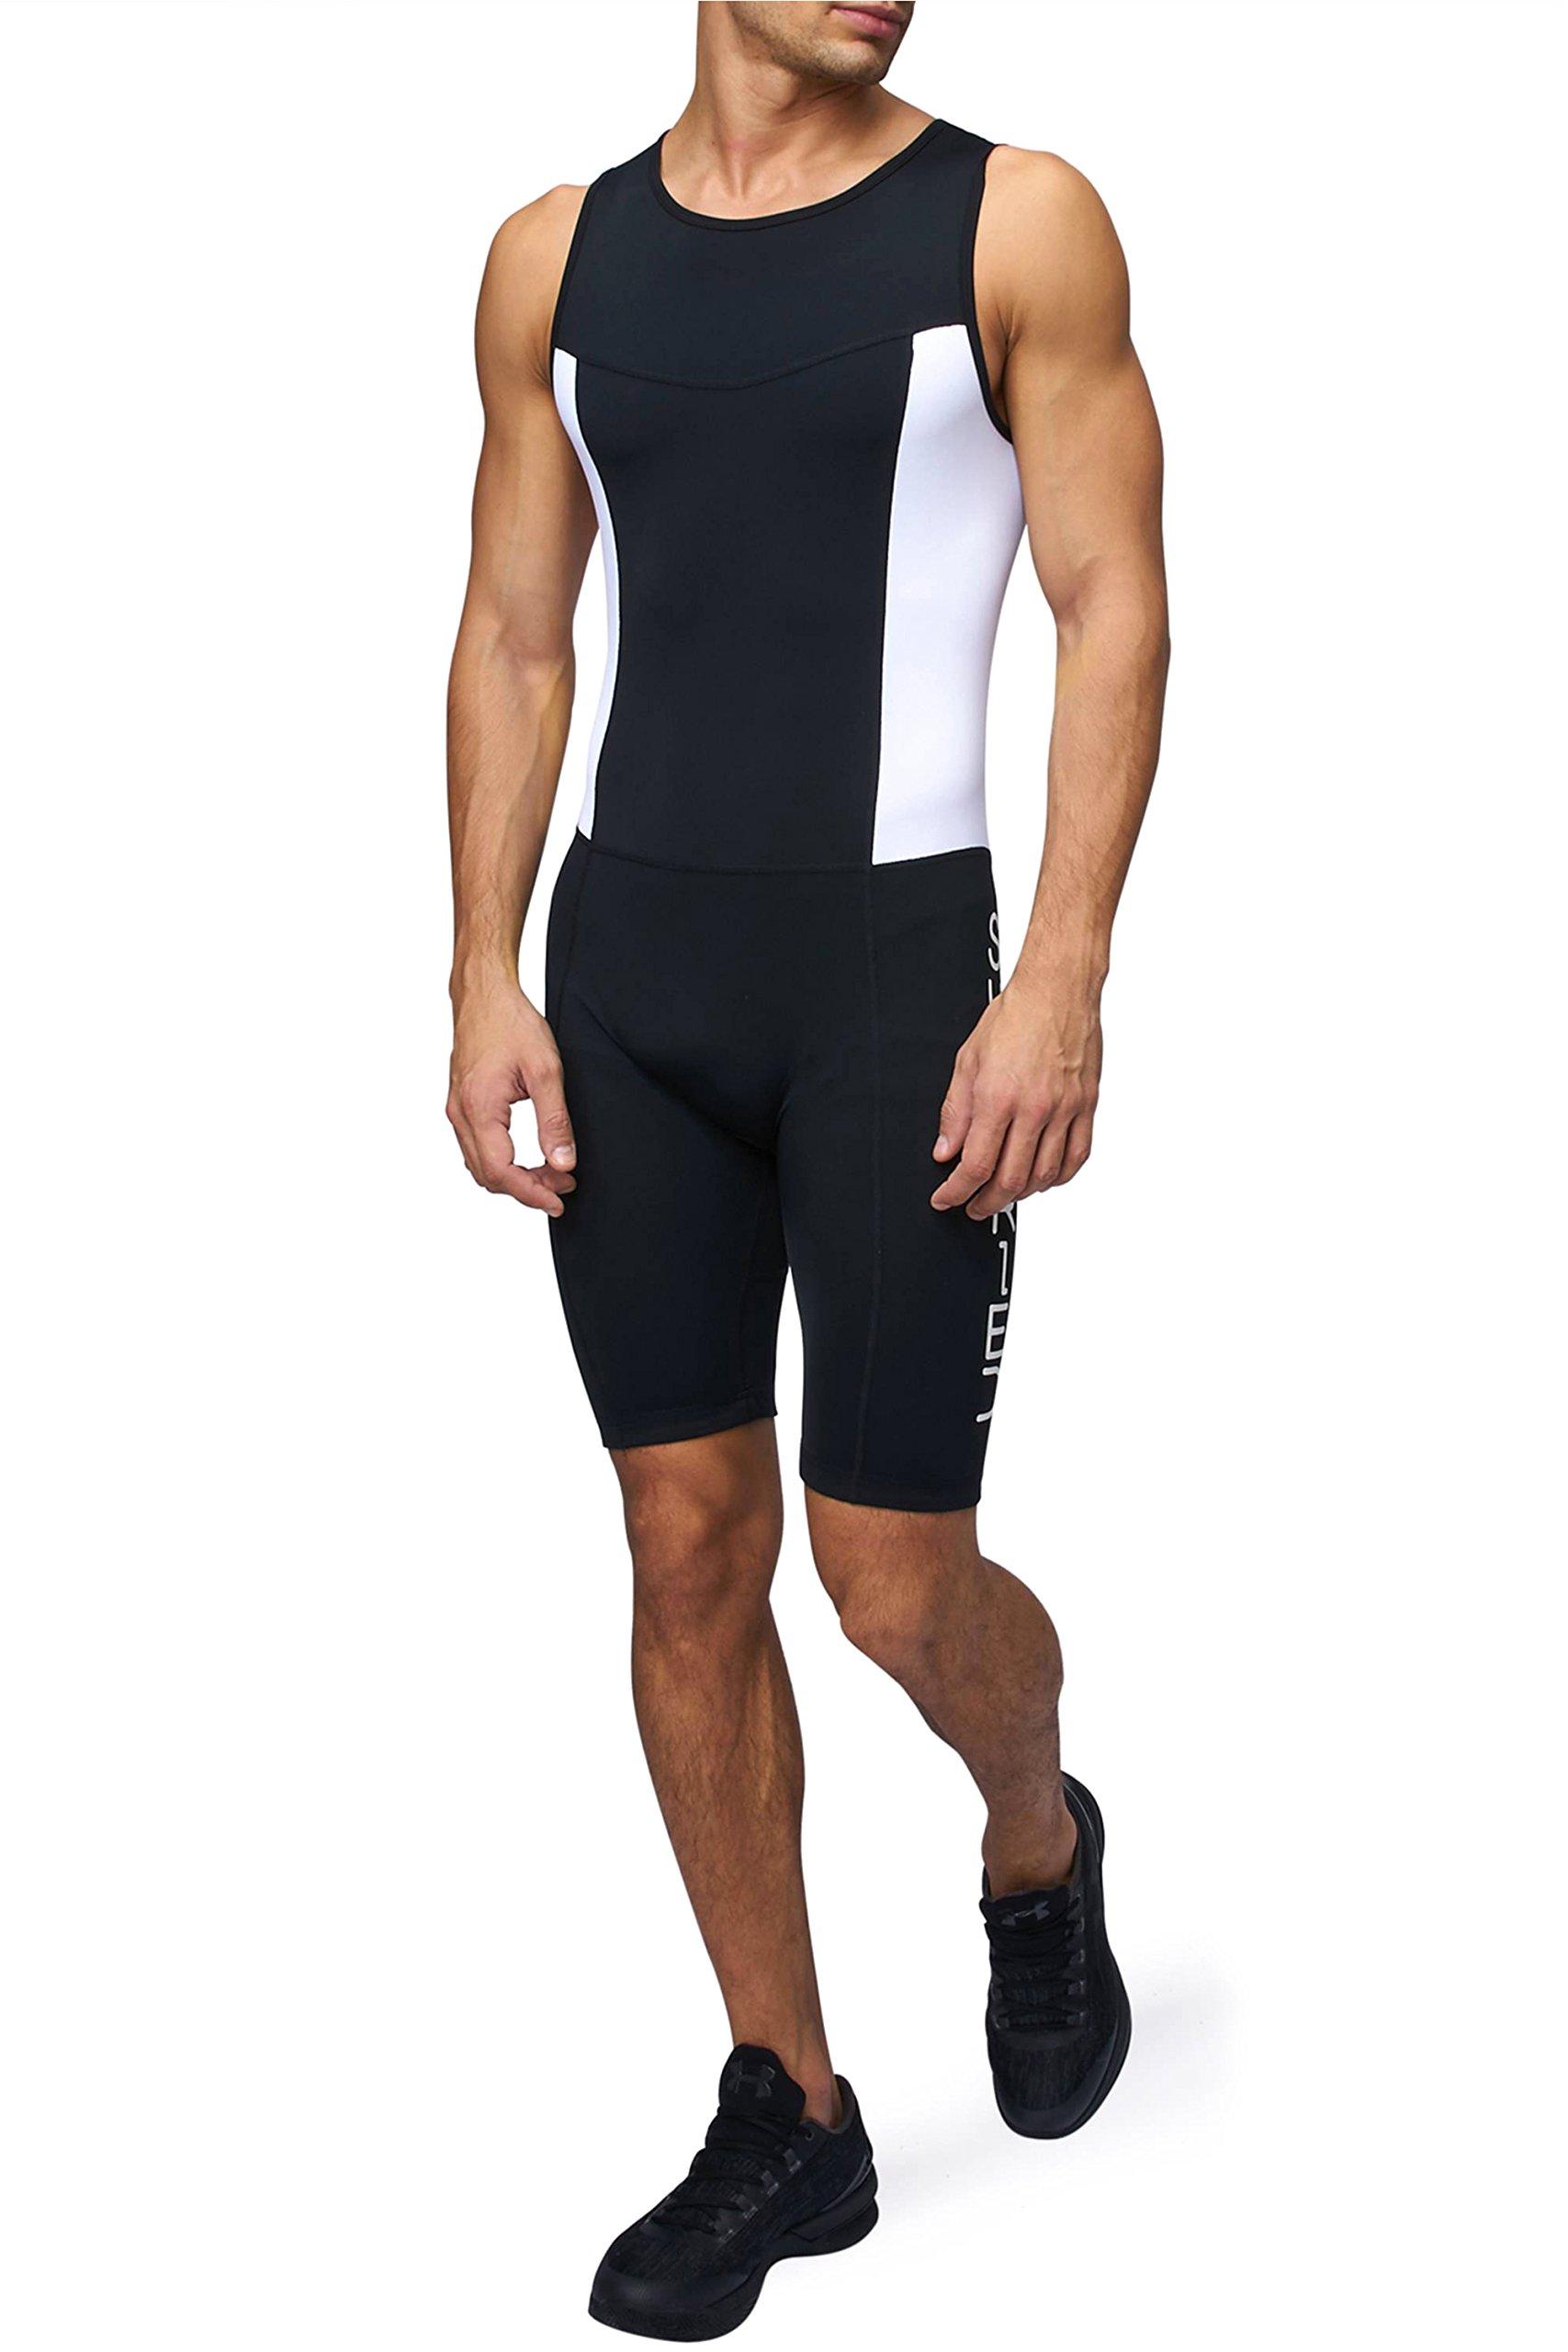 7a82f08ed53 Sundried Mens Premium Padded Triathlon Tri Suit Compression Duathlon ...